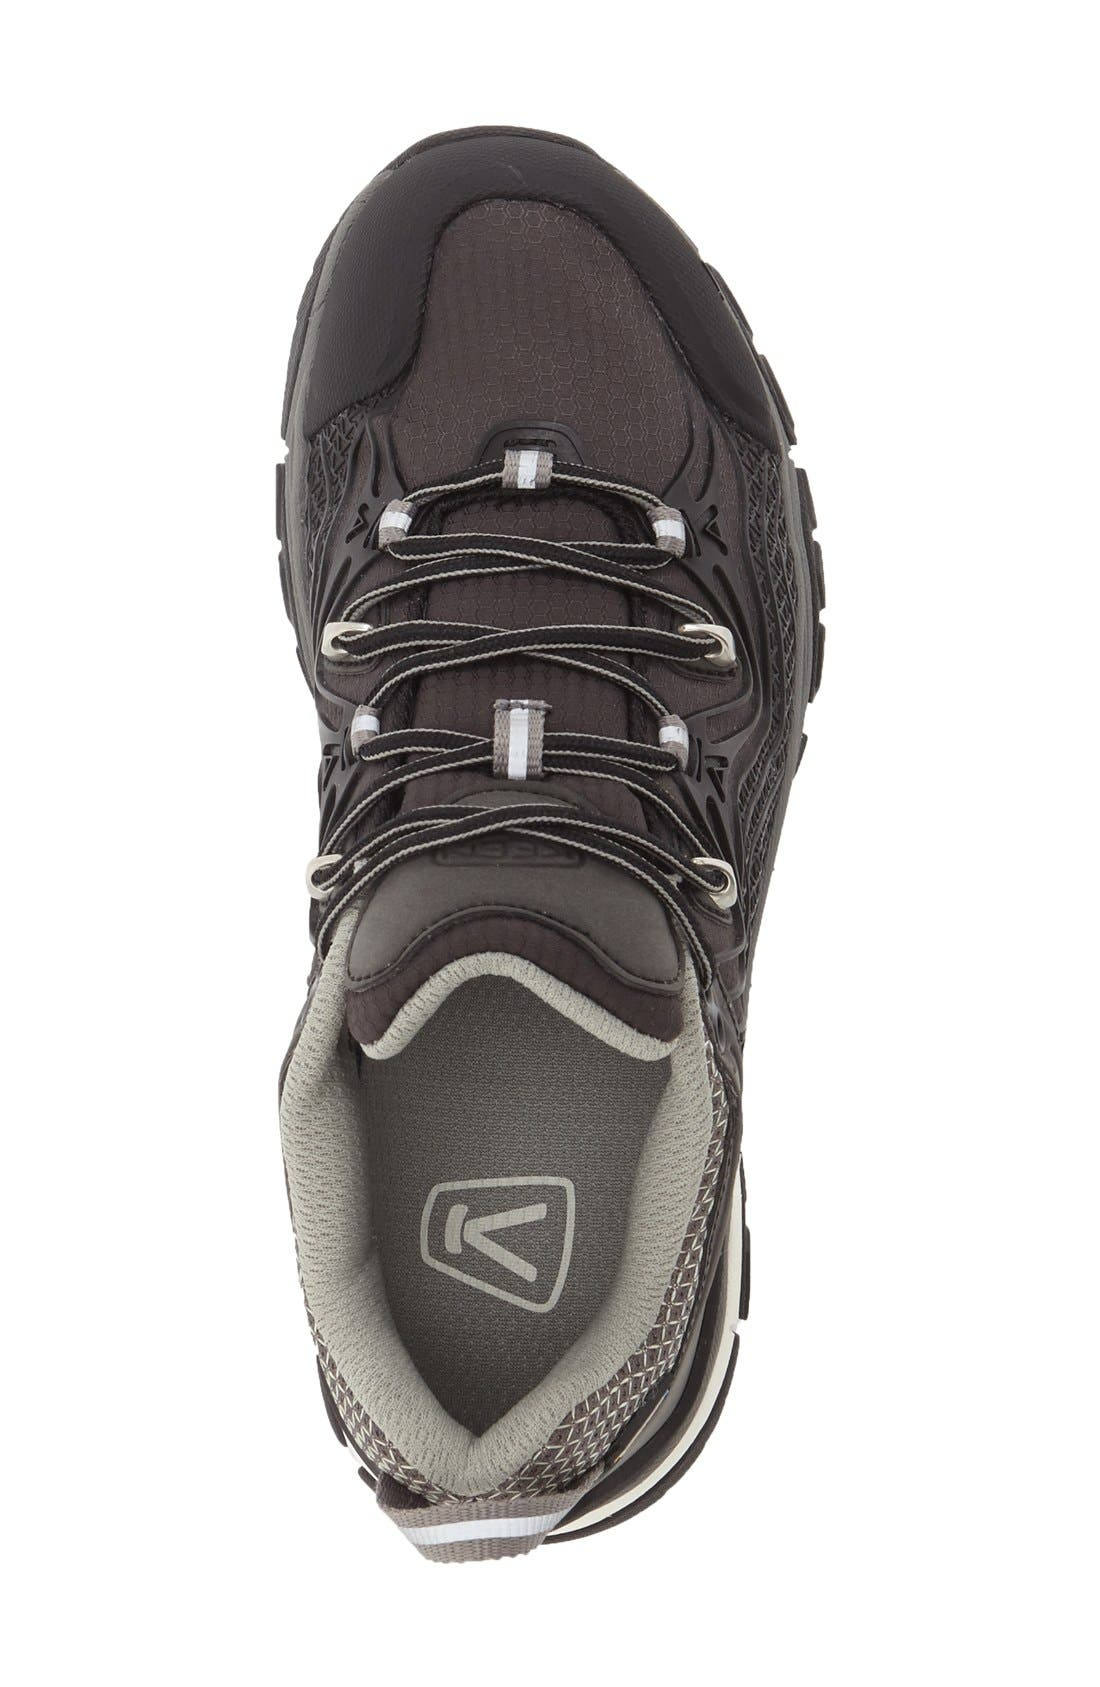 'Aphlex' Waterproof Hiking Boot,                             Alternate thumbnail 3, color,                             Black/ Gargoyle